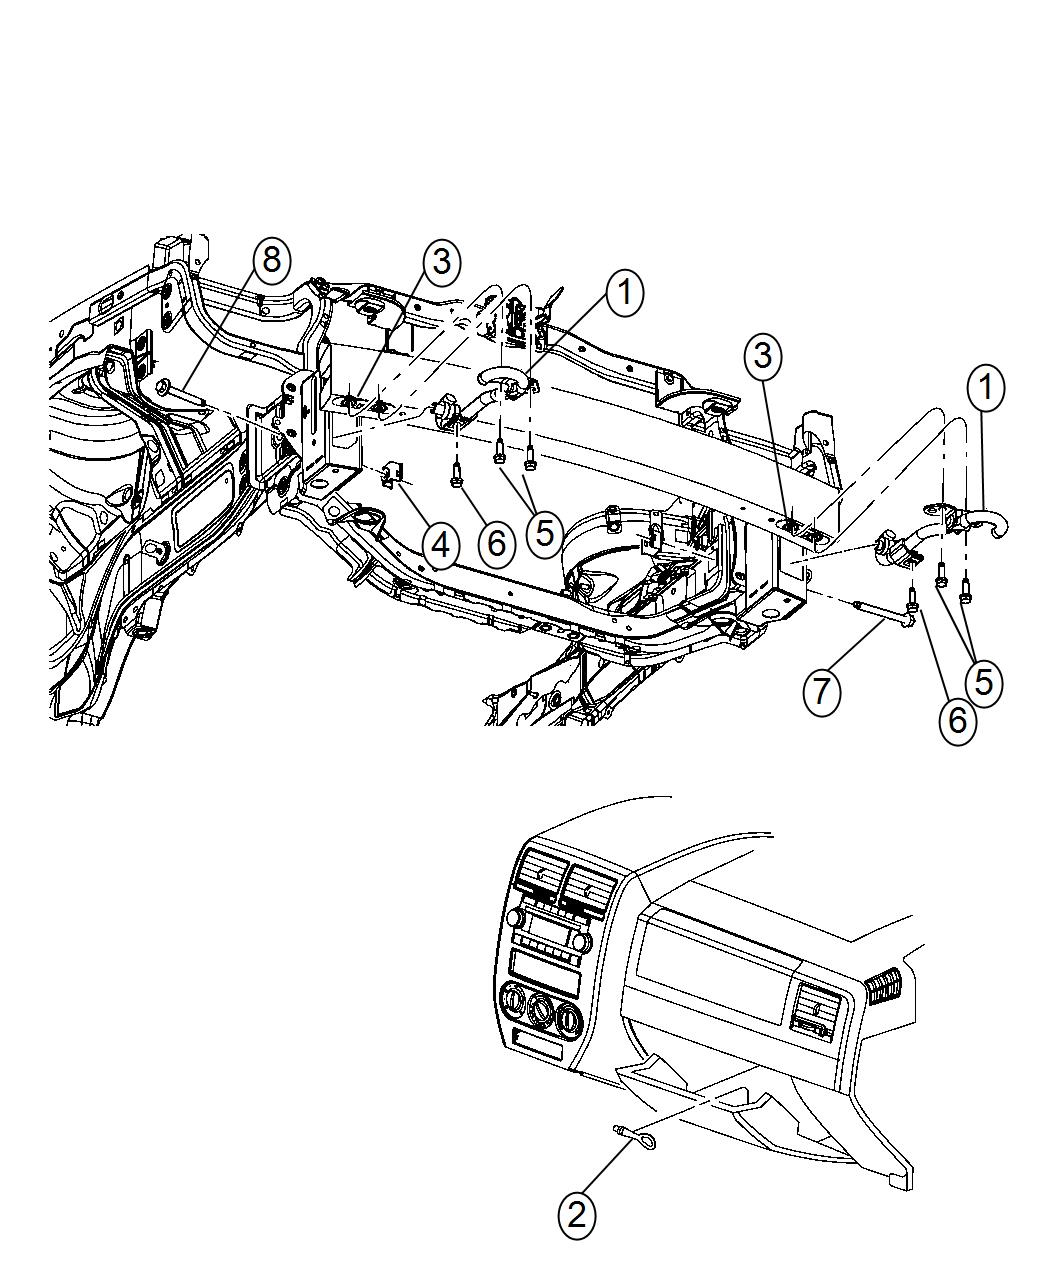 Jeep Patriot Hook Tow Tow Eye Brackets